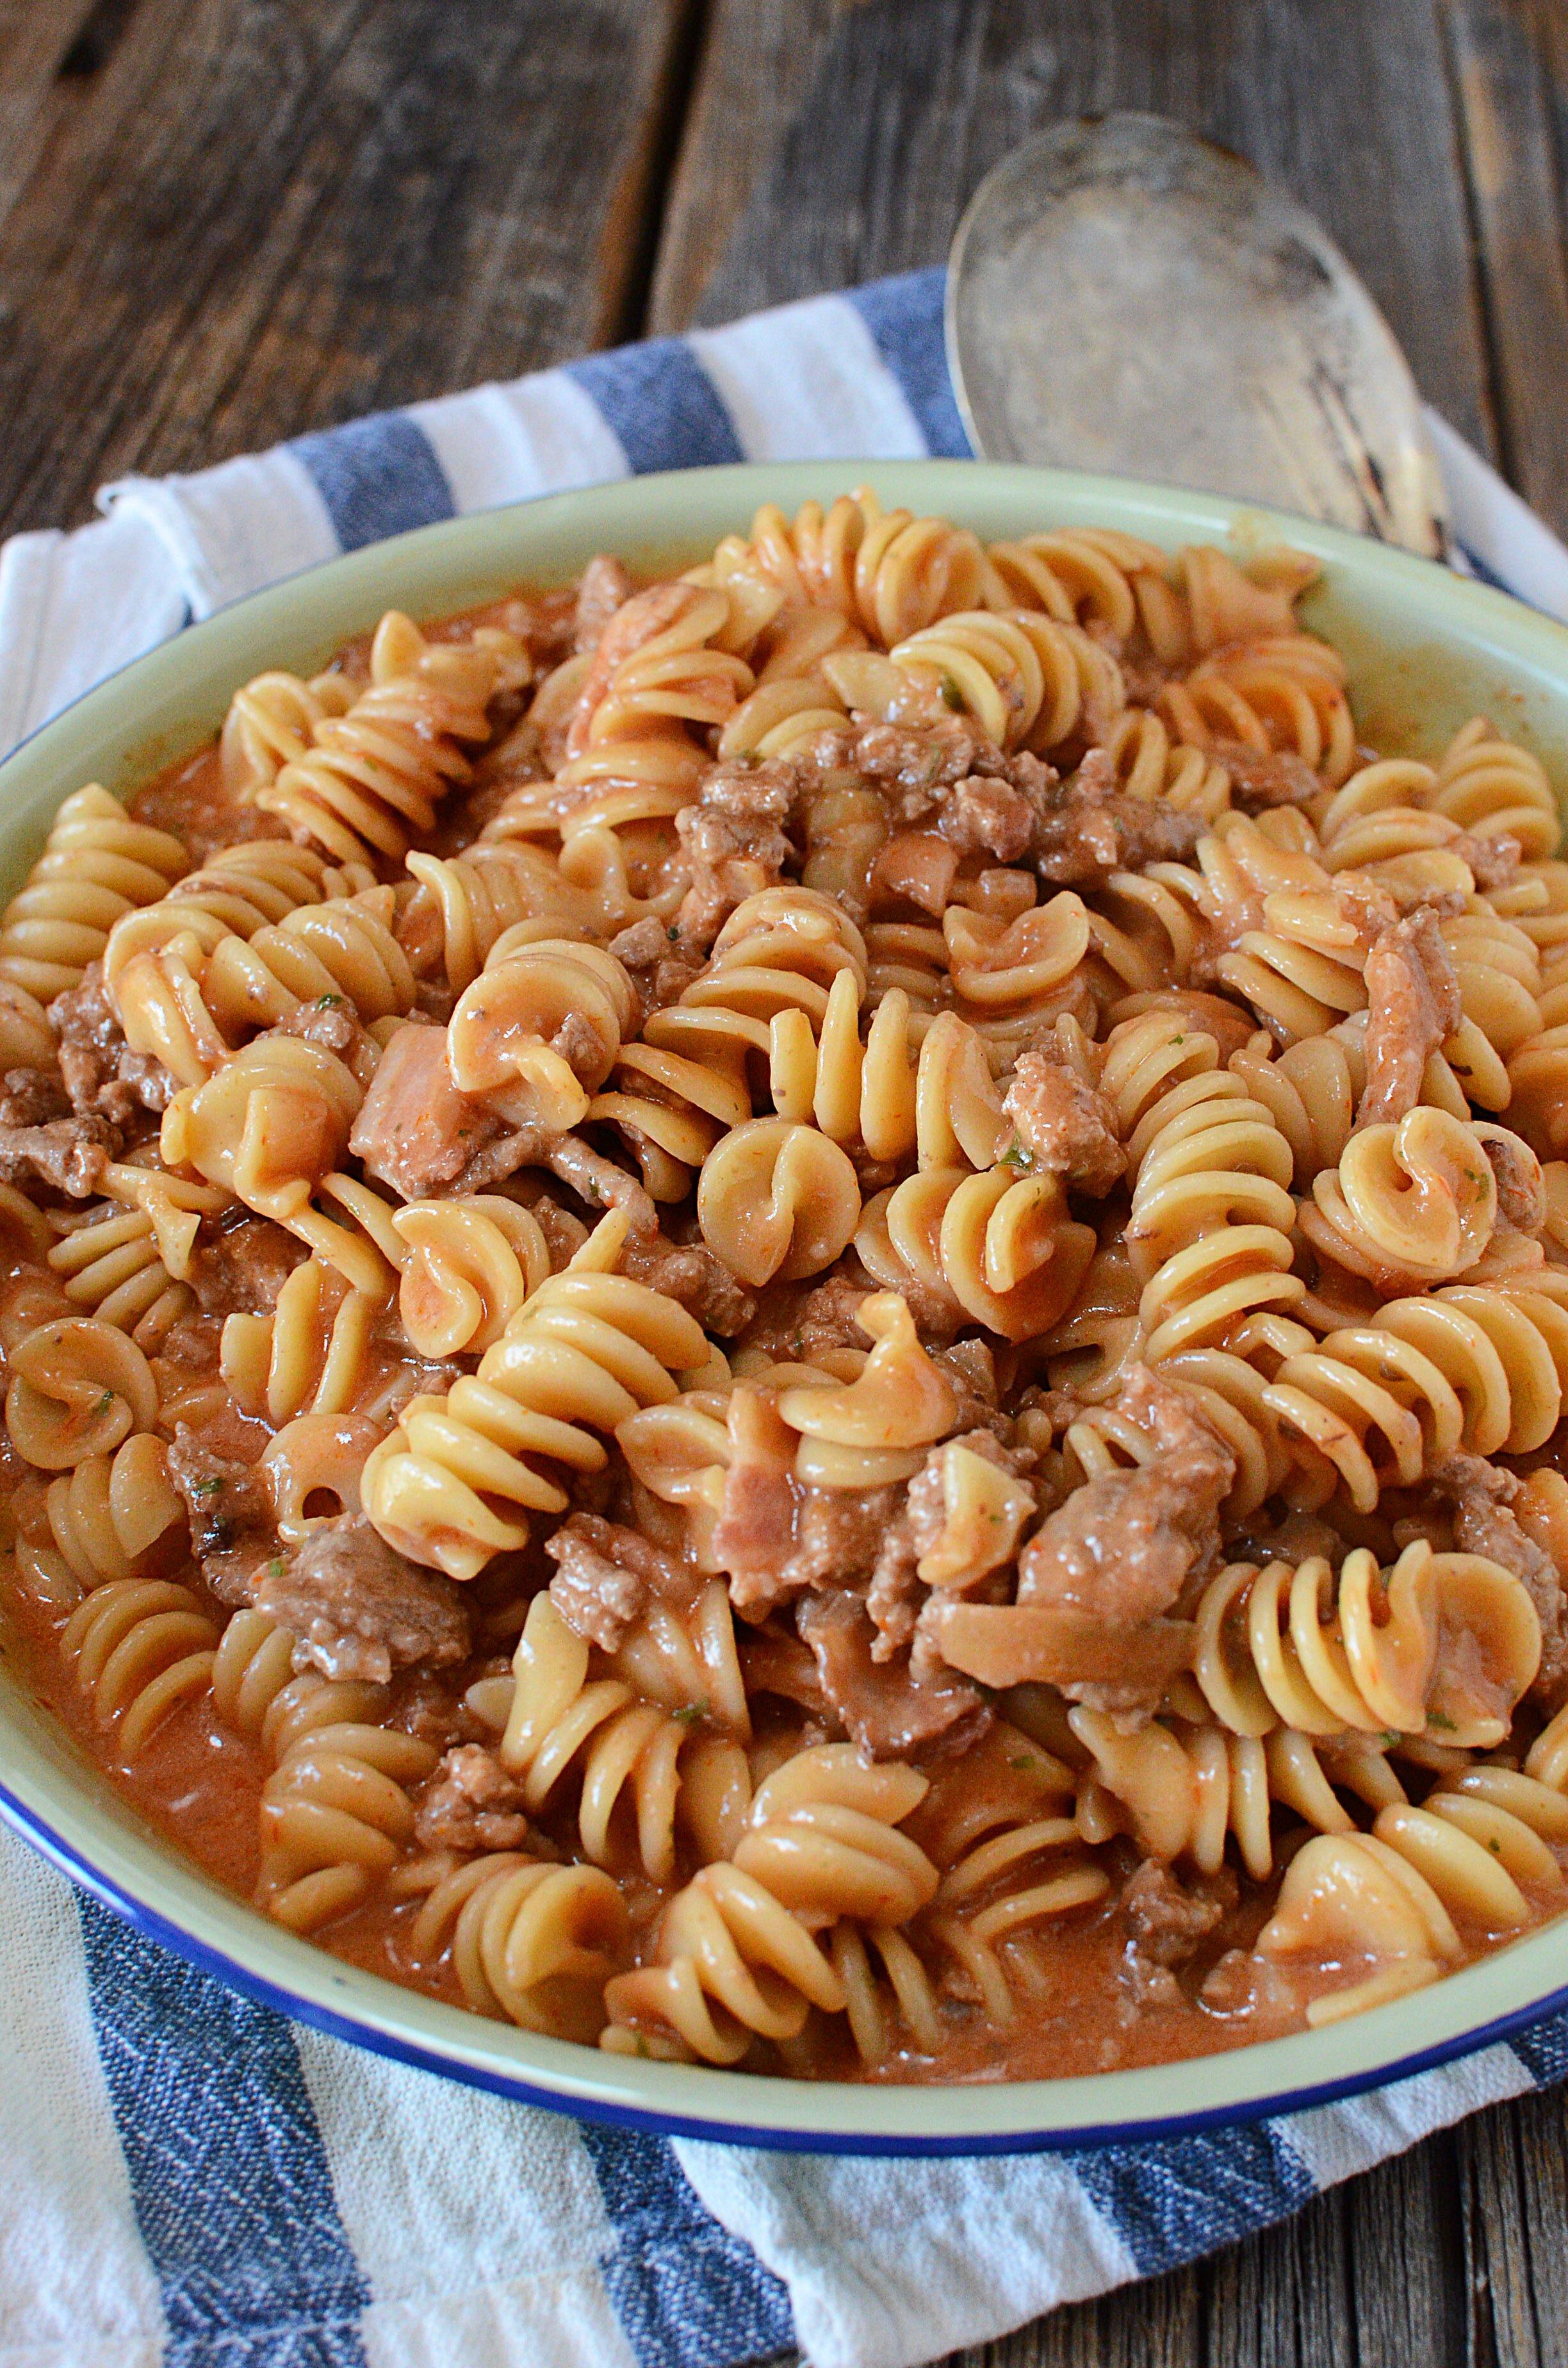 amish-casserole-20